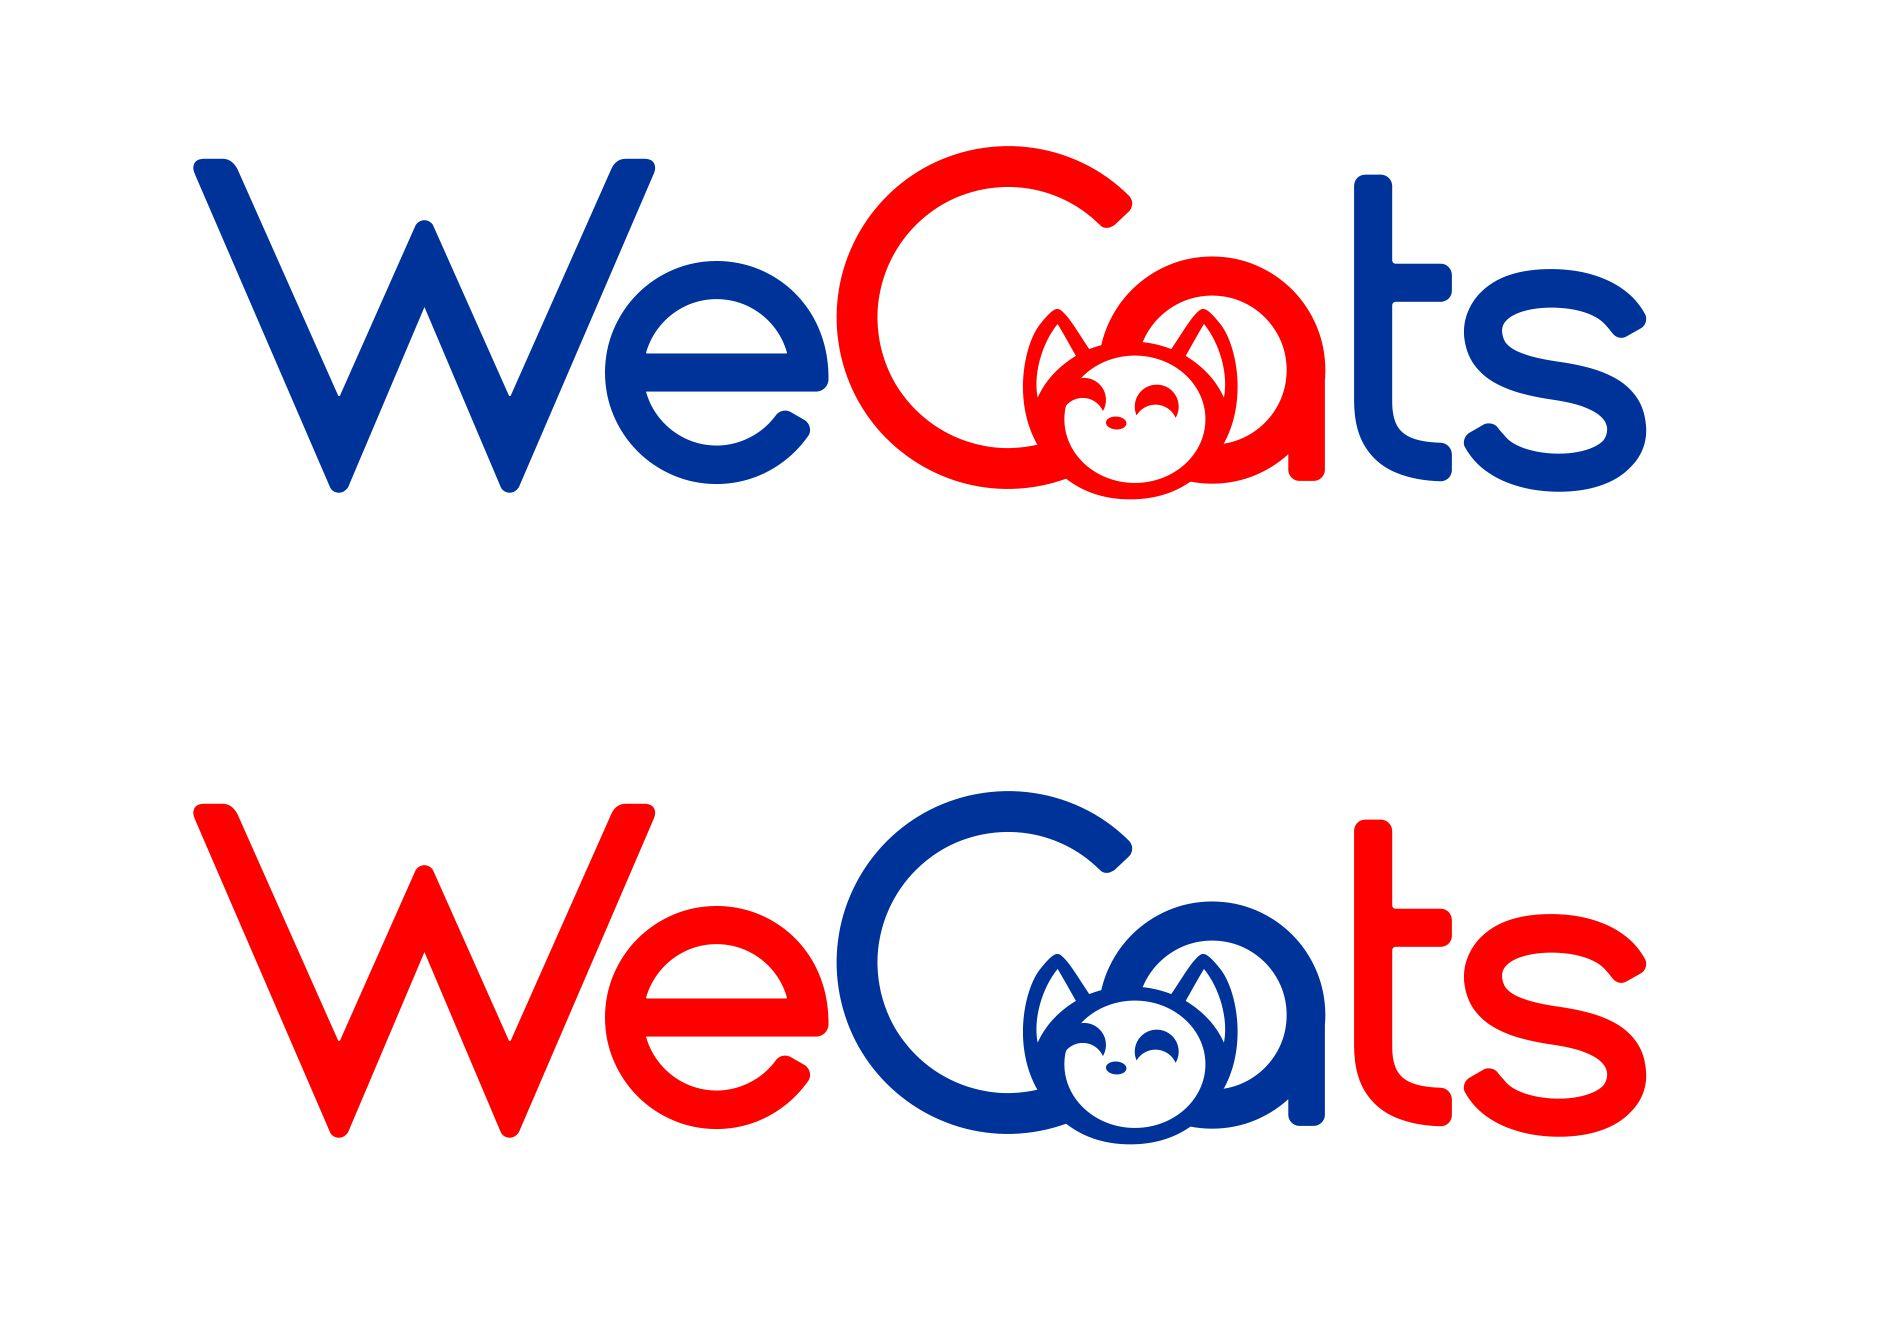 Создание логотипа WeCats фото f_7485f18b86d46617.jpg